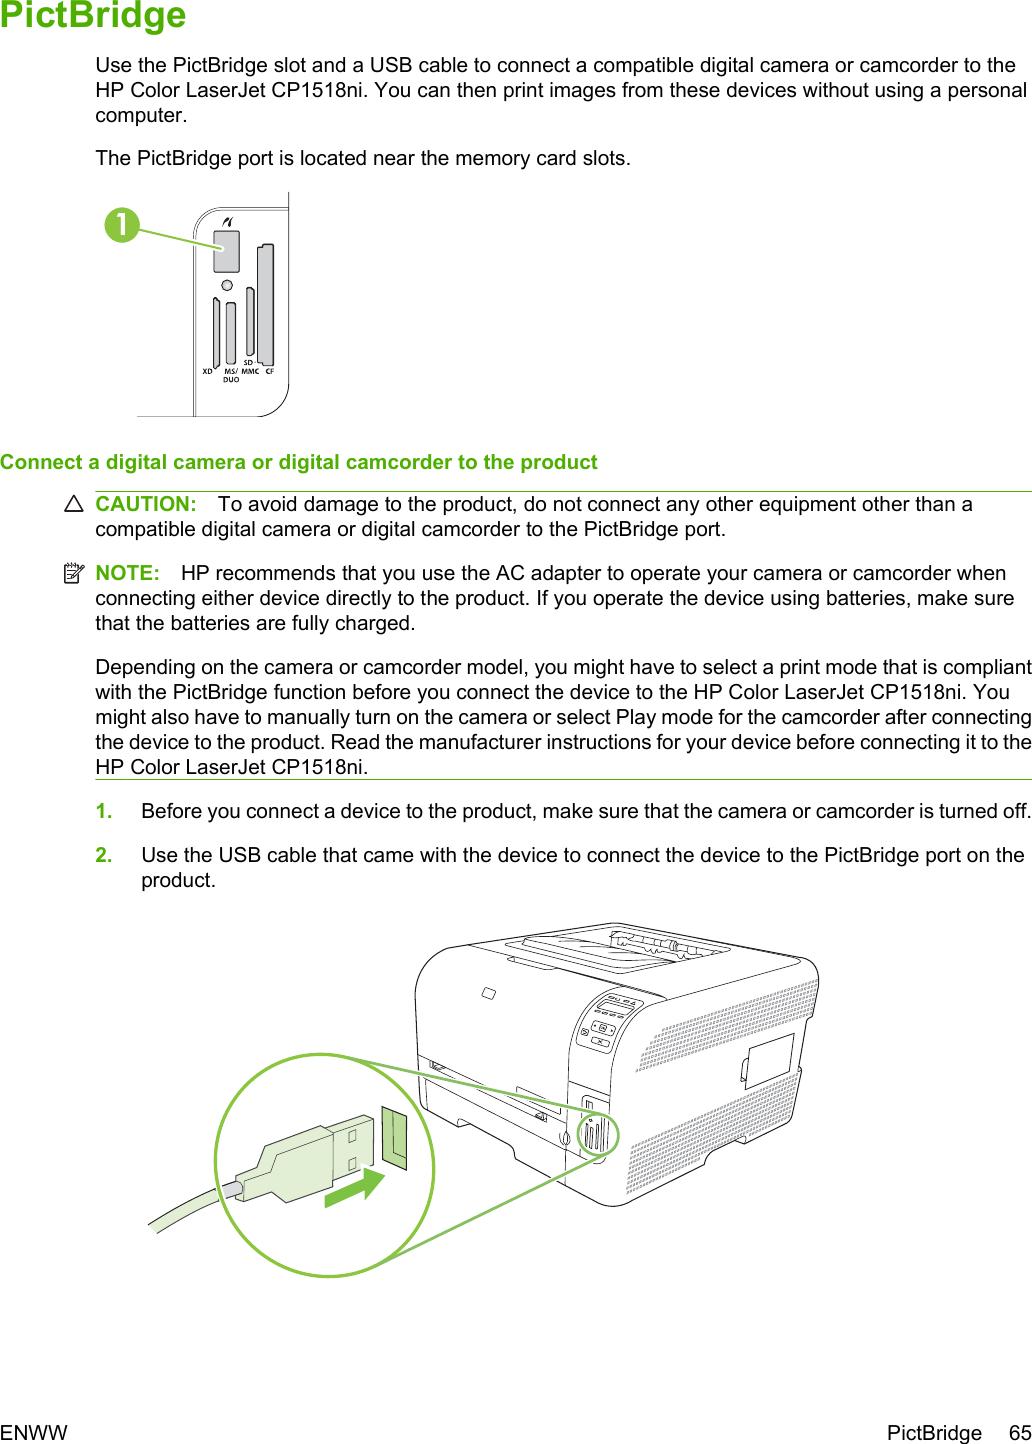 hp color laserjet cp1215 toolbox download for windows 7